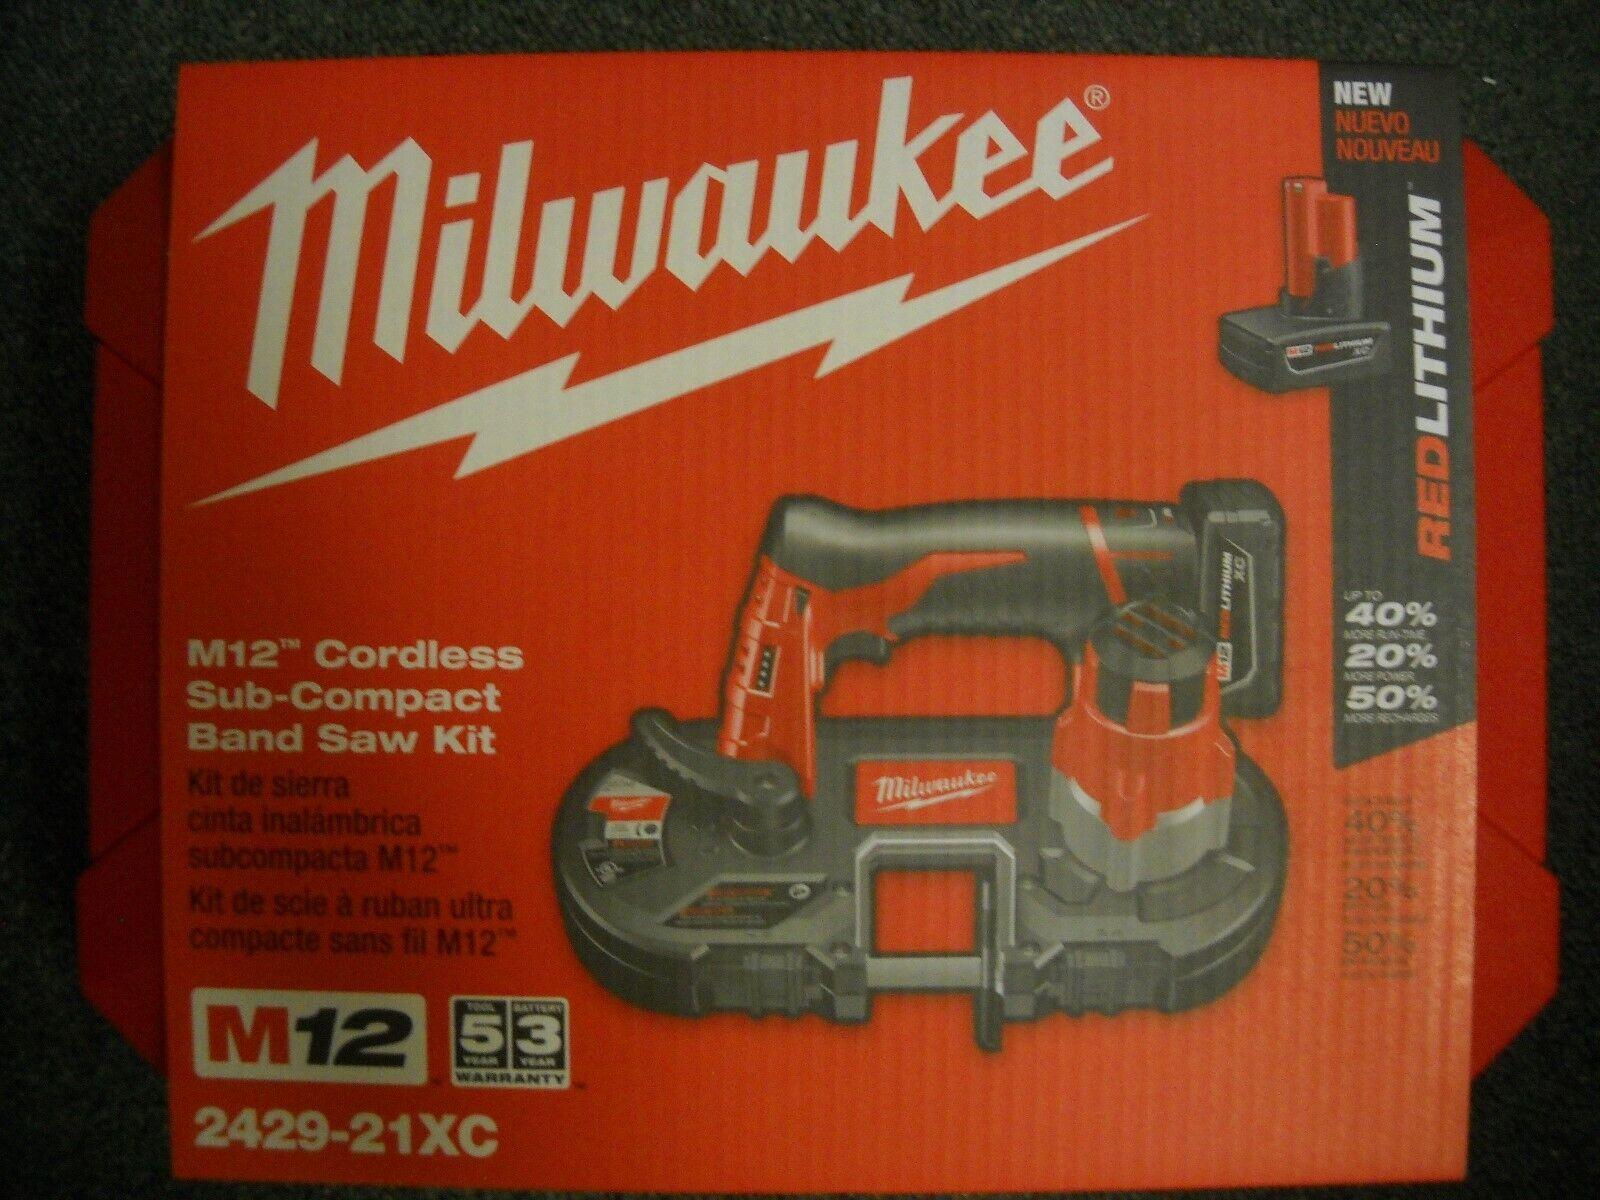 Milwaukee 2429-21XC M12 12Volt Lithium-Ion Cordless Sub-Comp